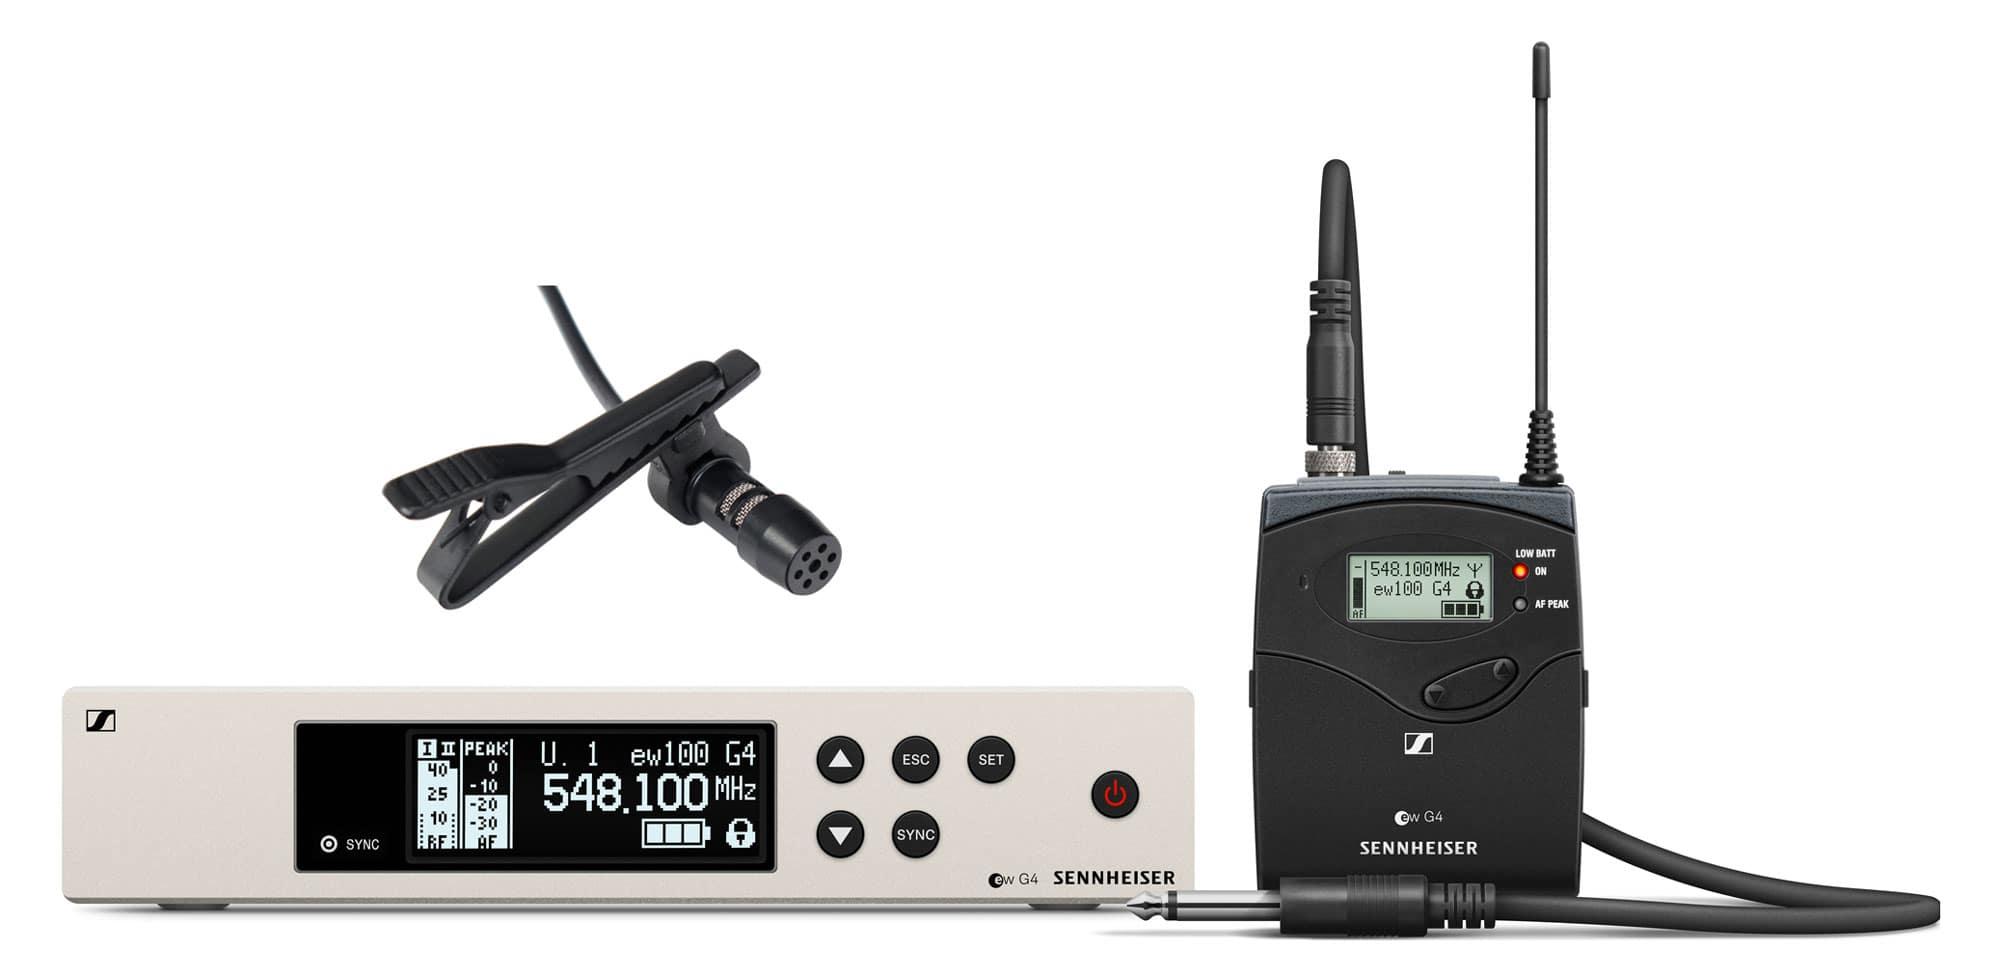 Drahtlossysteme - Sennheiser EW 100 G4 Ci1 Instrument Funkset 1G8 inkl. LA 30 EA Lavaliermikrofon - Onlineshop Musikhaus Kirstein